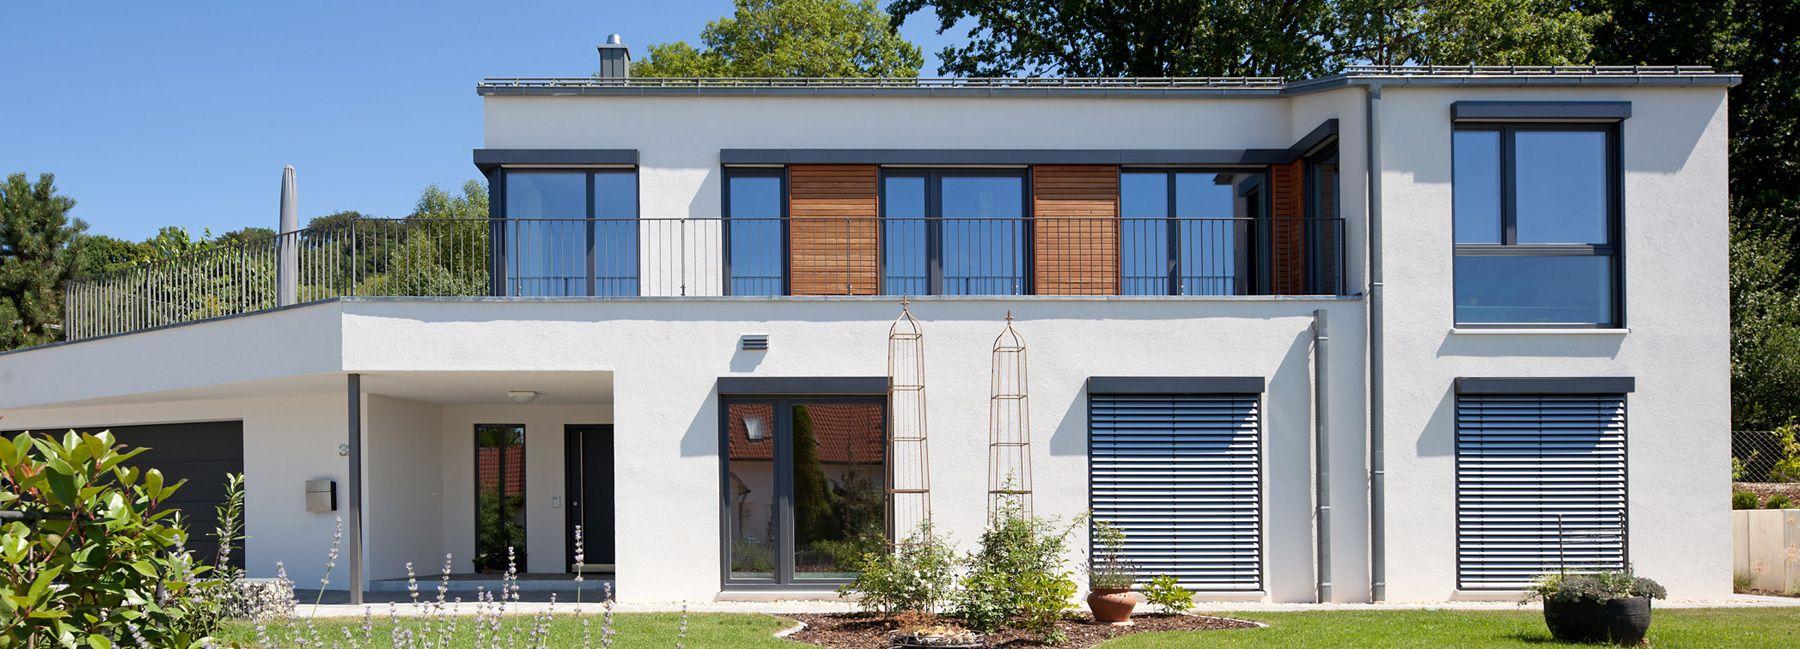 baustoffe jura holzbau holzhaus bayern holzhaus regensburg holzhaus ingolstadt holzhaus neumarkt. Black Bedroom Furniture Sets. Home Design Ideas